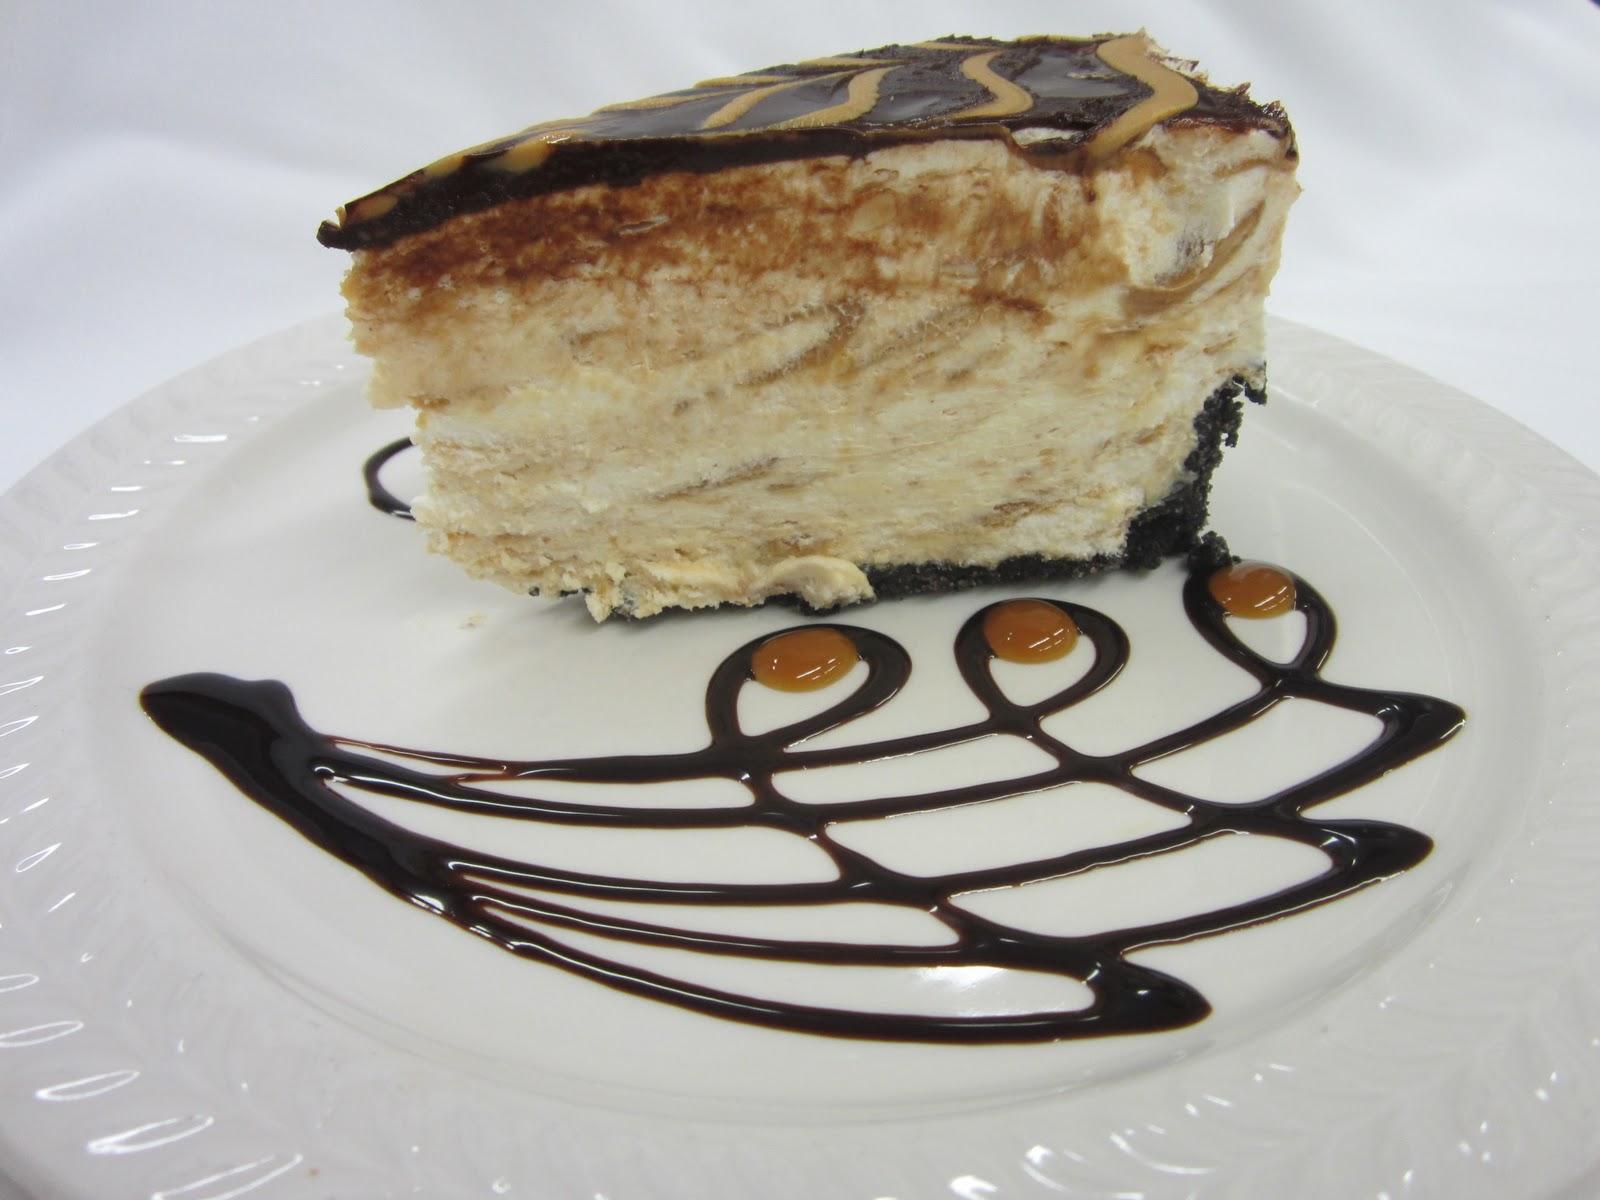 http://4.bp.blogspot.com/-vEUn29Ur39M/ToZOQhqF7rI/AAAAAAAABcc/esUS5T729JE/s1600/Peanut+Butter+Cheese+Cake+009.jpg